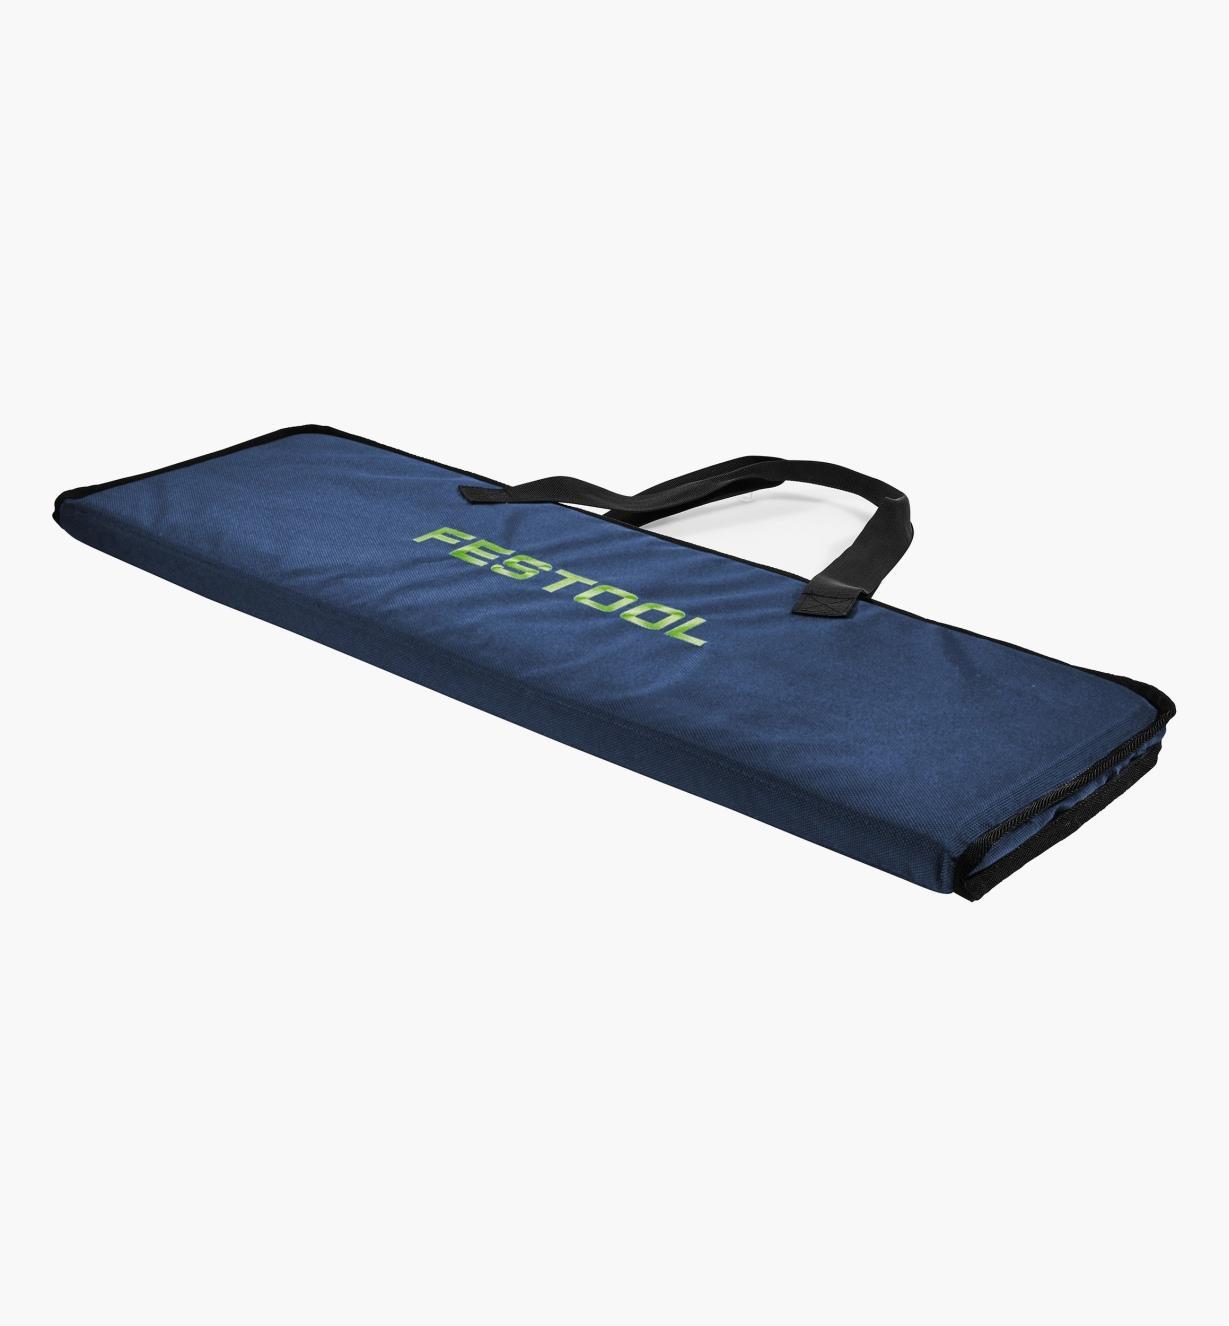 ZA200160 - Guide Rail Tote Bag FSK 420